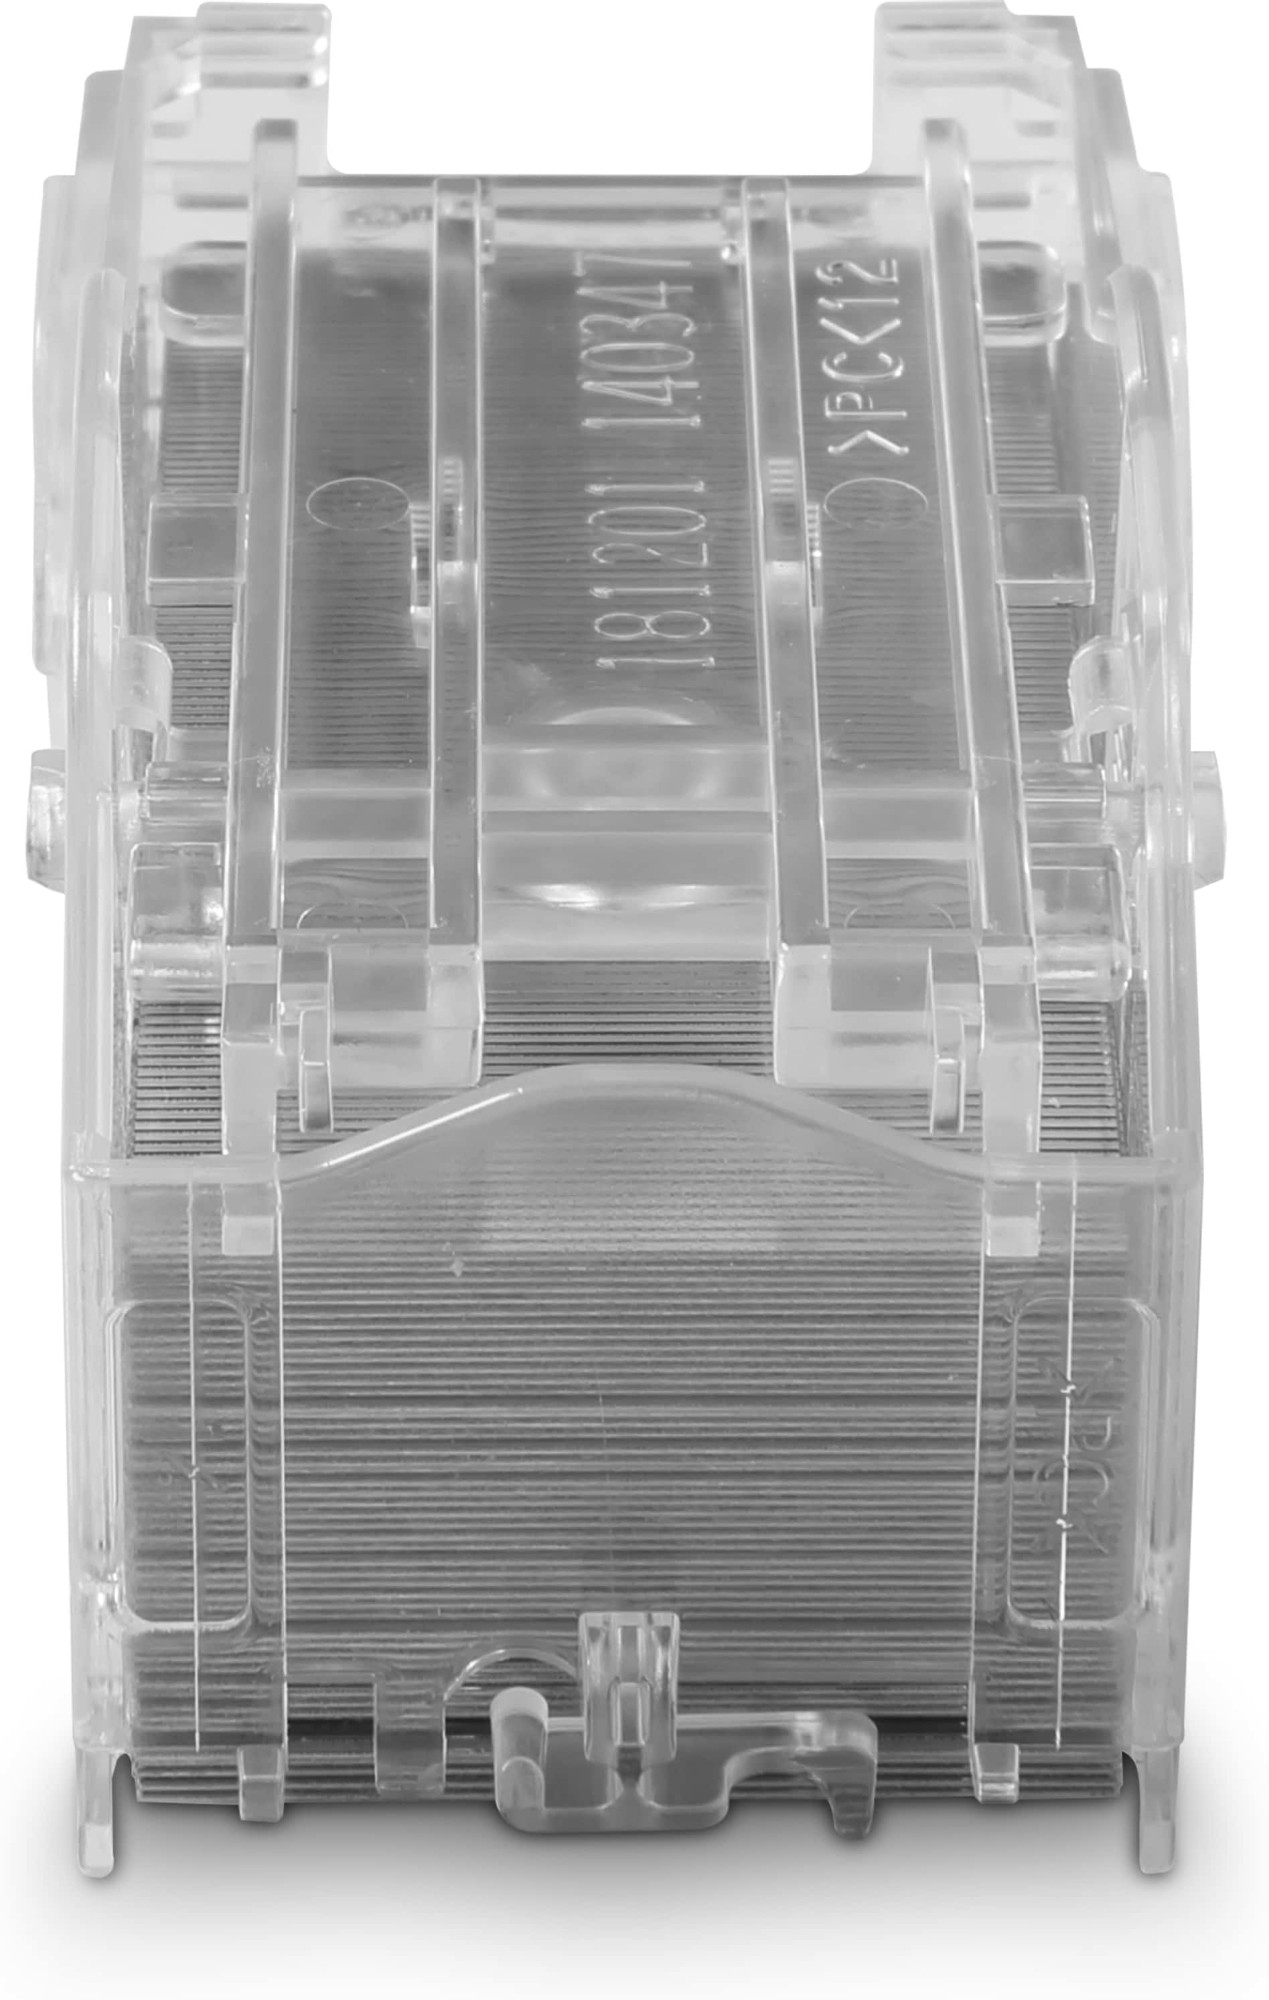 HP Rellenador de Cartucho de Grapas